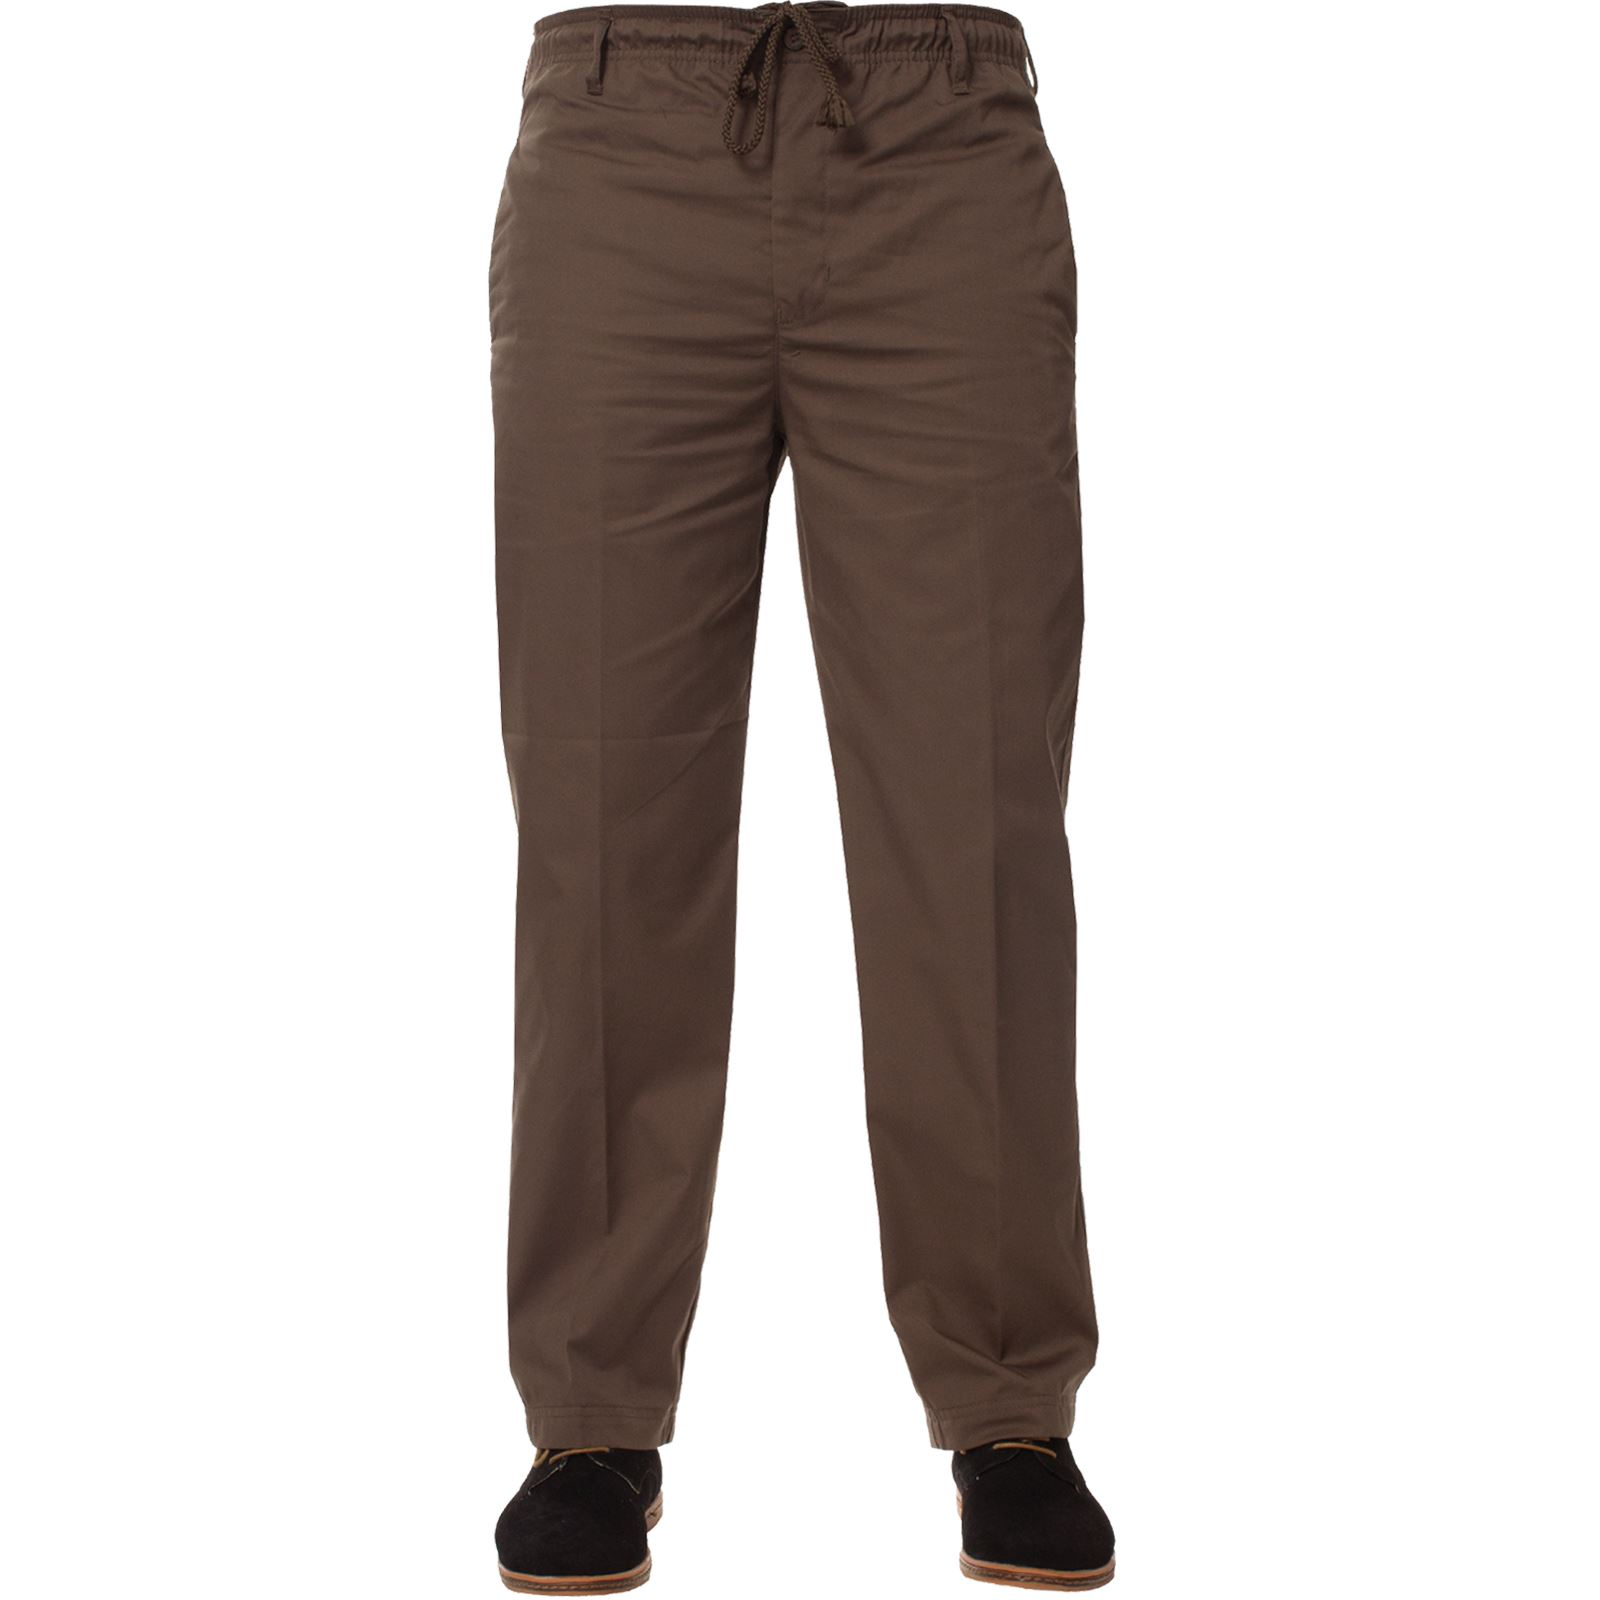 Para-Hombres-Pantalones-De-Rugby-Kruze-cintura-elastica-con-cordon-pantalones-REGULAR-King-Tamanos miniatura 13